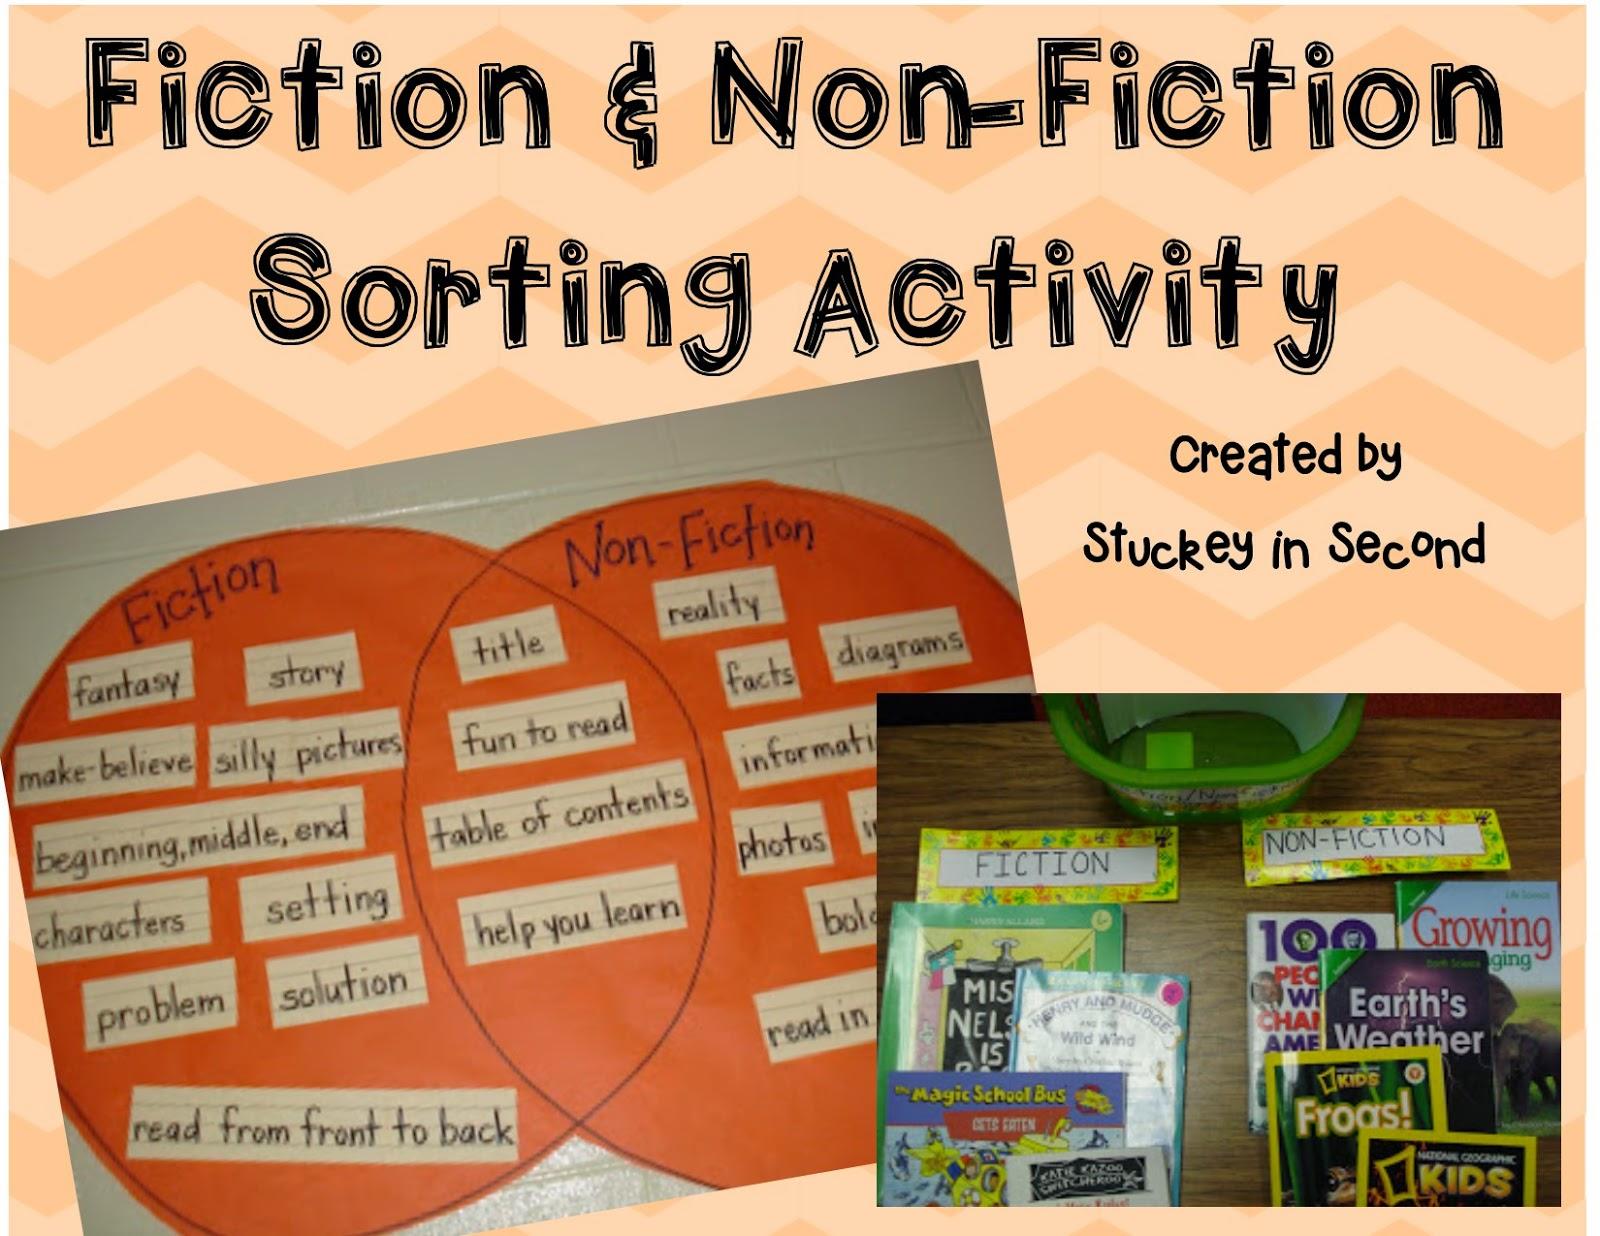 Fiction Band Bnon Bfiction Bbook Bsort on Fiction And Nonfiction Venn Diagram